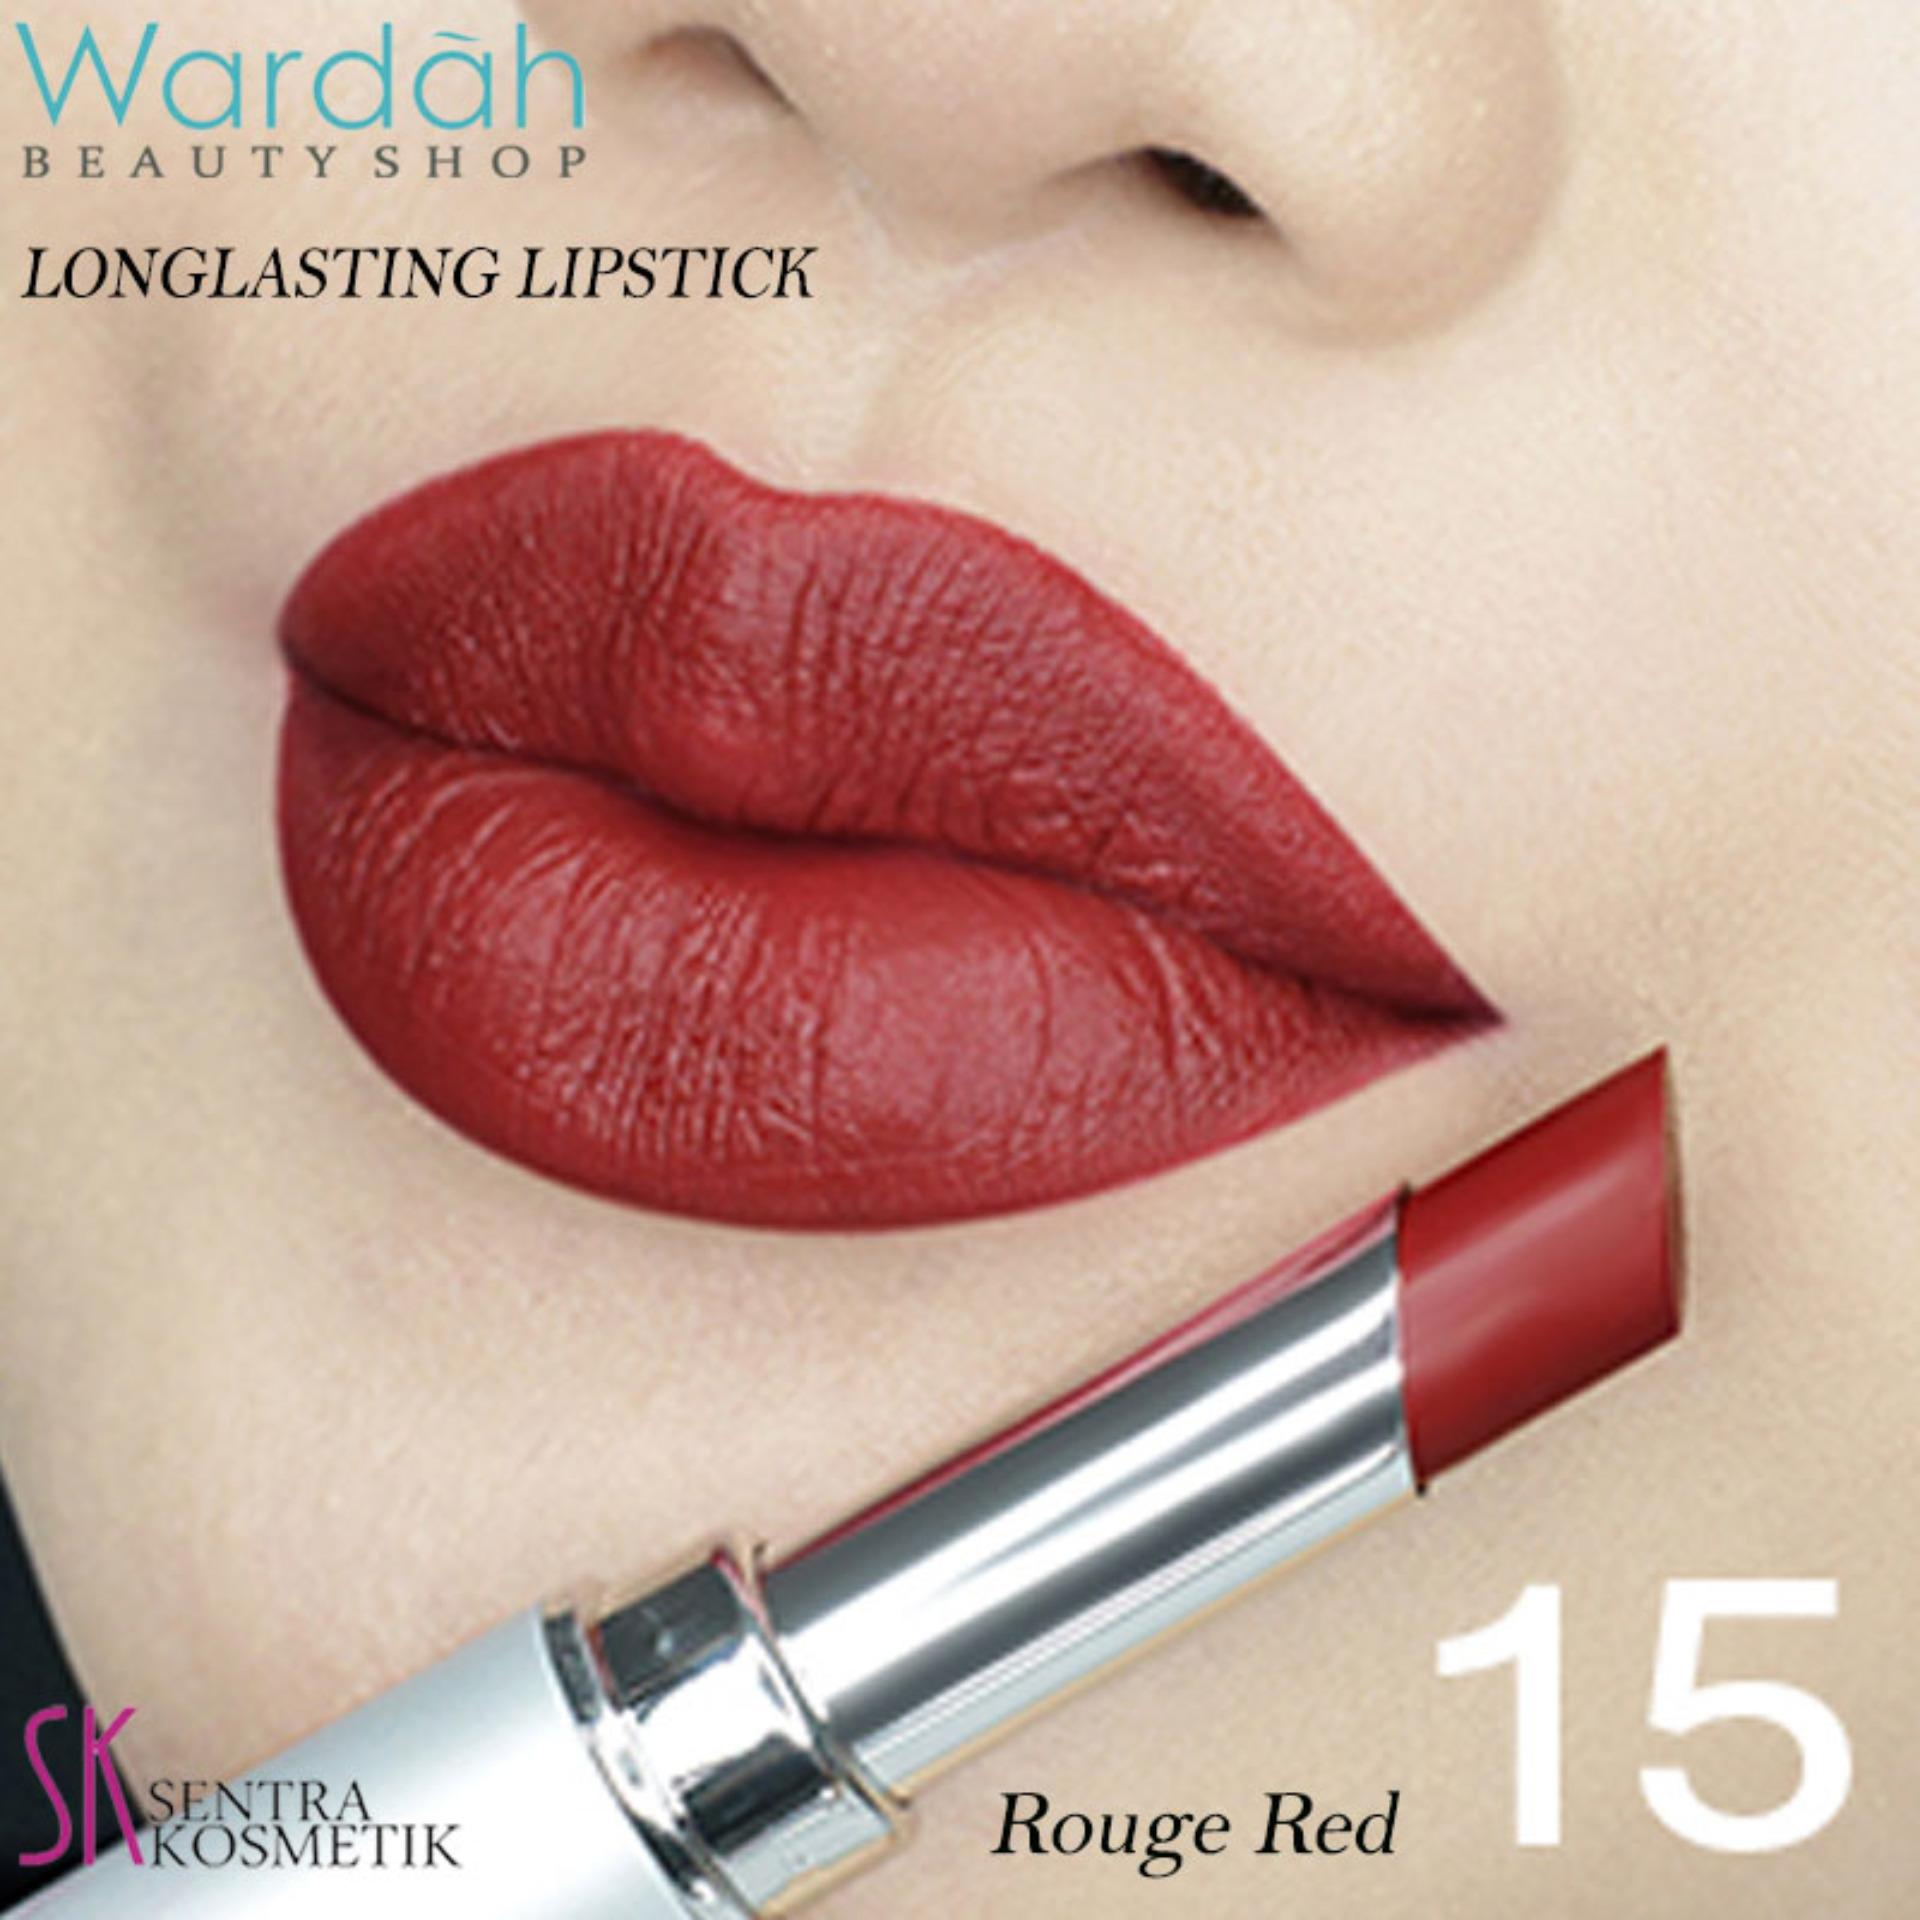 Hemat Wardah Longlasting Lipstick No 15 Rouge Red Facial